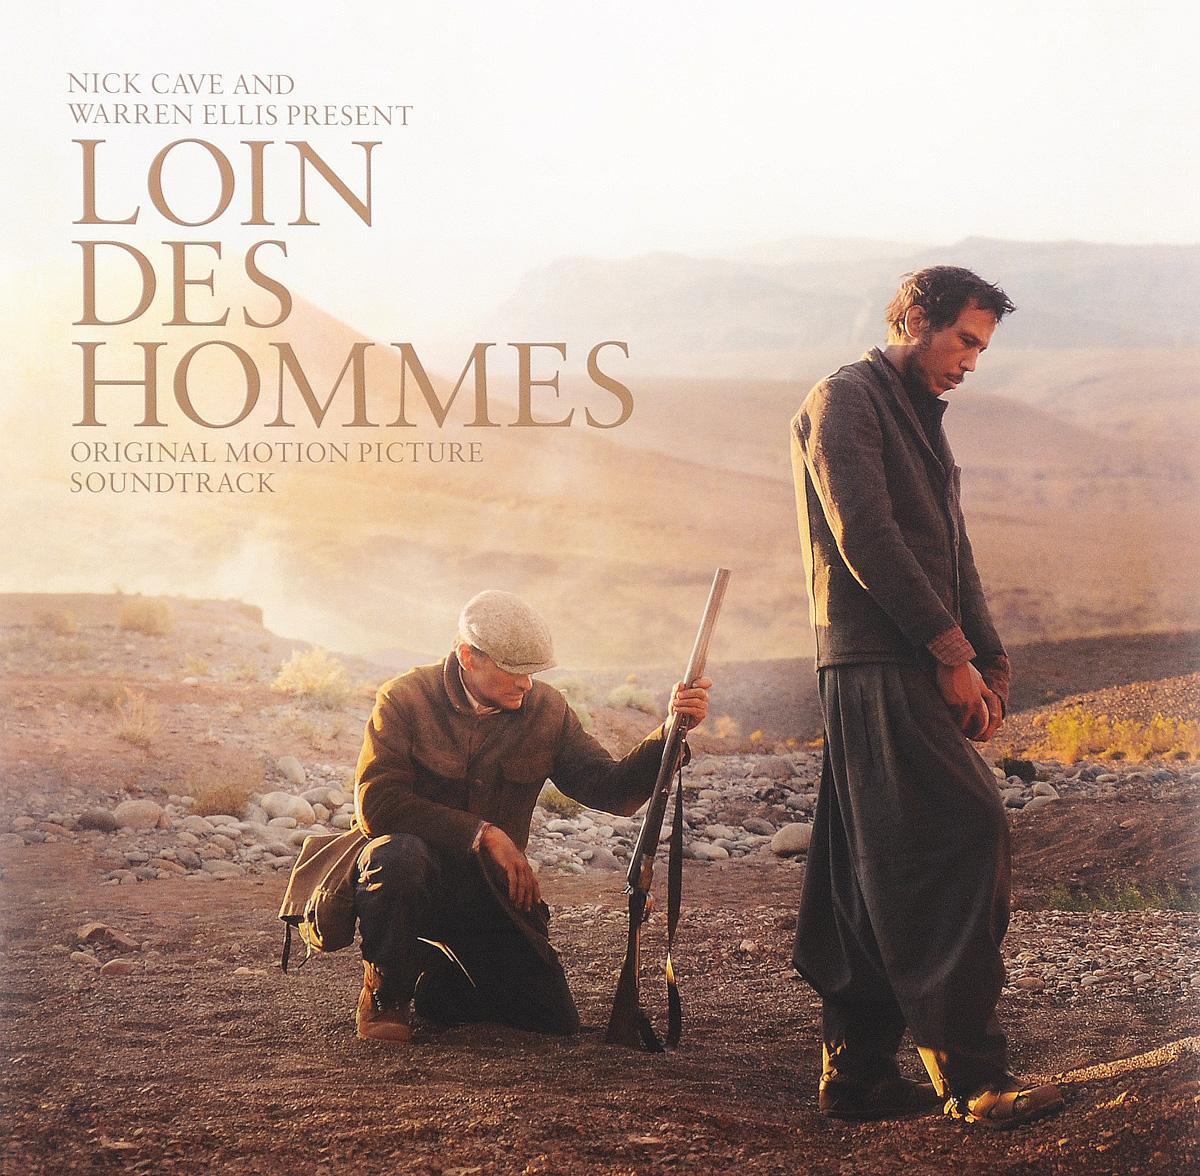 Ник Кейв,Уоррен Эллис Nick Cave and Warren Ellis. Loin Des Hommes. Original Motion Picture Soundtrack (LP) виниловая пластинка nick cave ellis warren kings ost